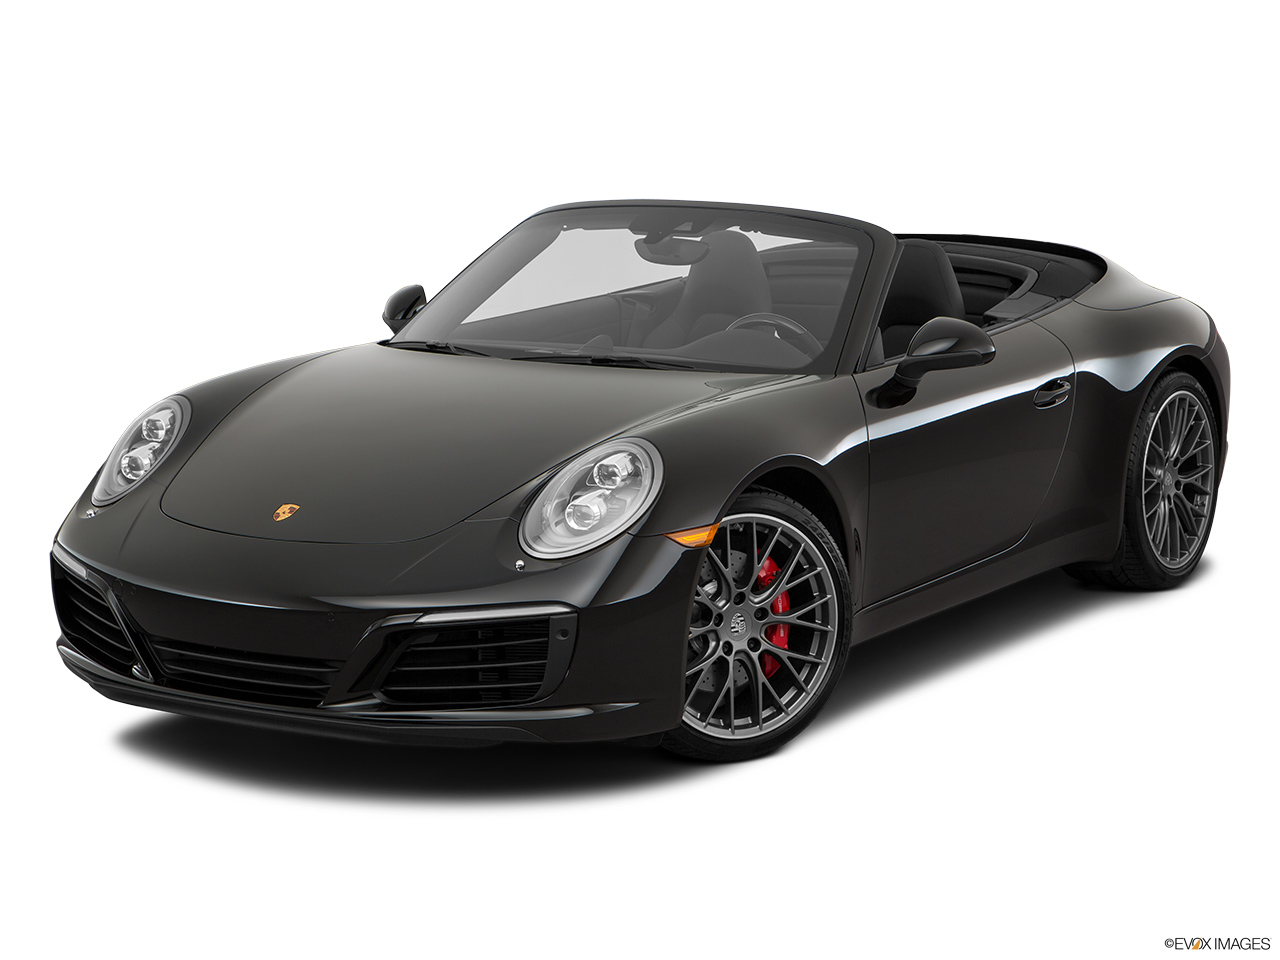 Porsche 911 2017 Carrera Cabriolet In Qatar New Car